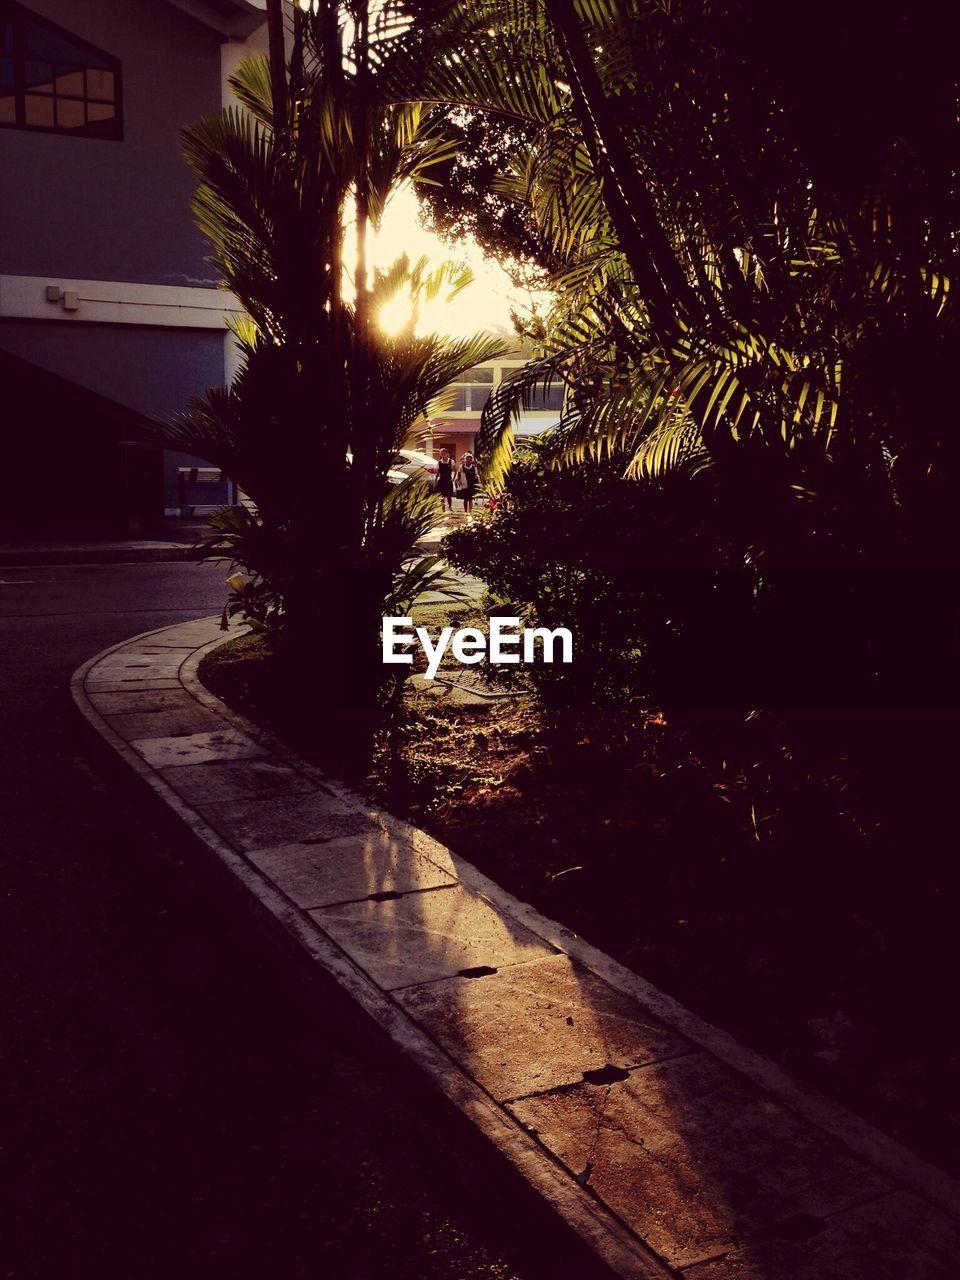 night, tree, no people, palm tree, outdoors, illuminated, building exterior, architecture, nature, city, sky